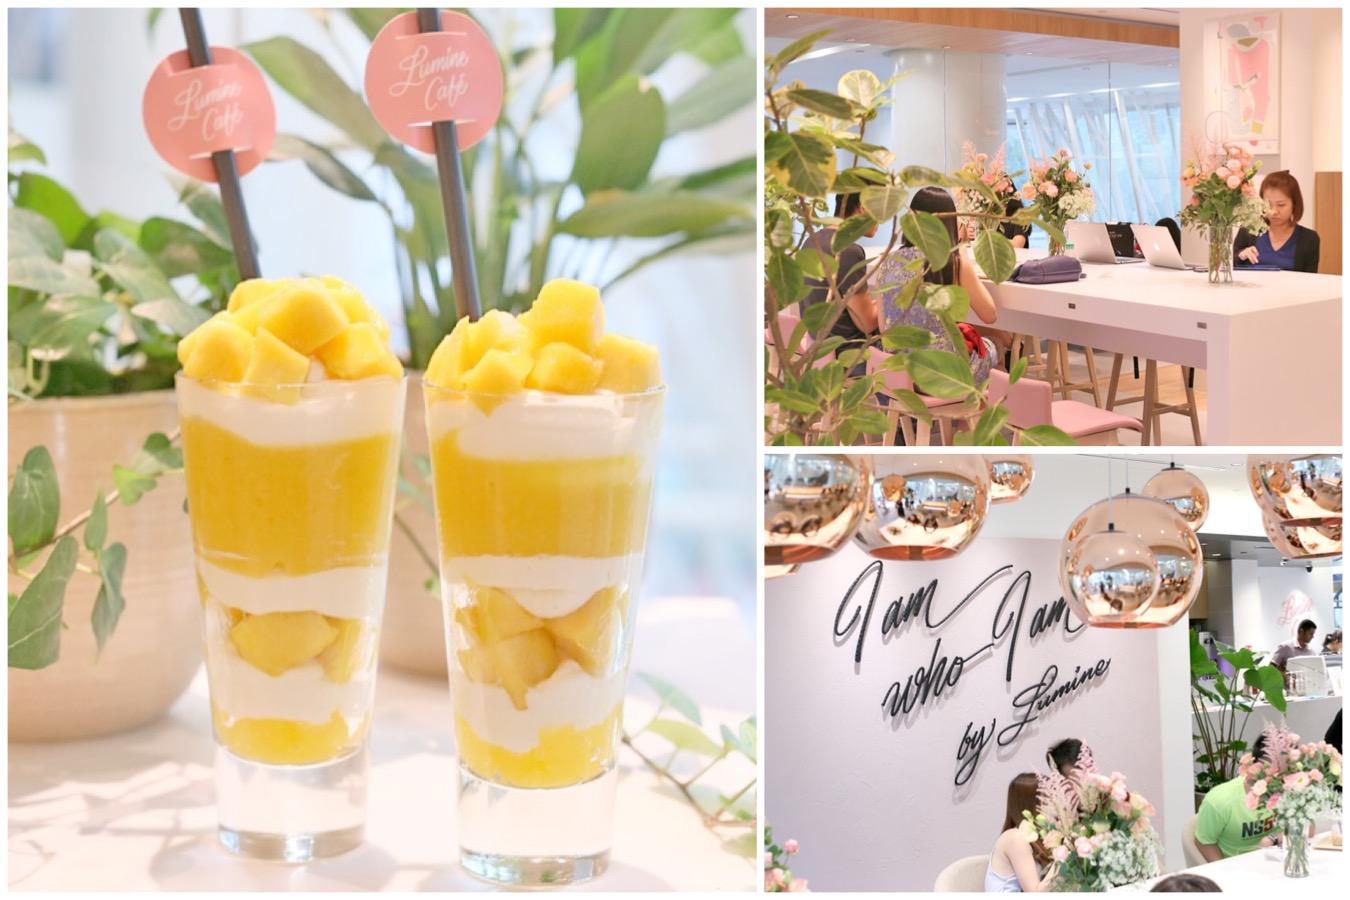 LUMINE Café Singapore - 1st Ever LUMINE Café Opens At Clarke Quay Central, Offering Fruit Parfaits And Drinks